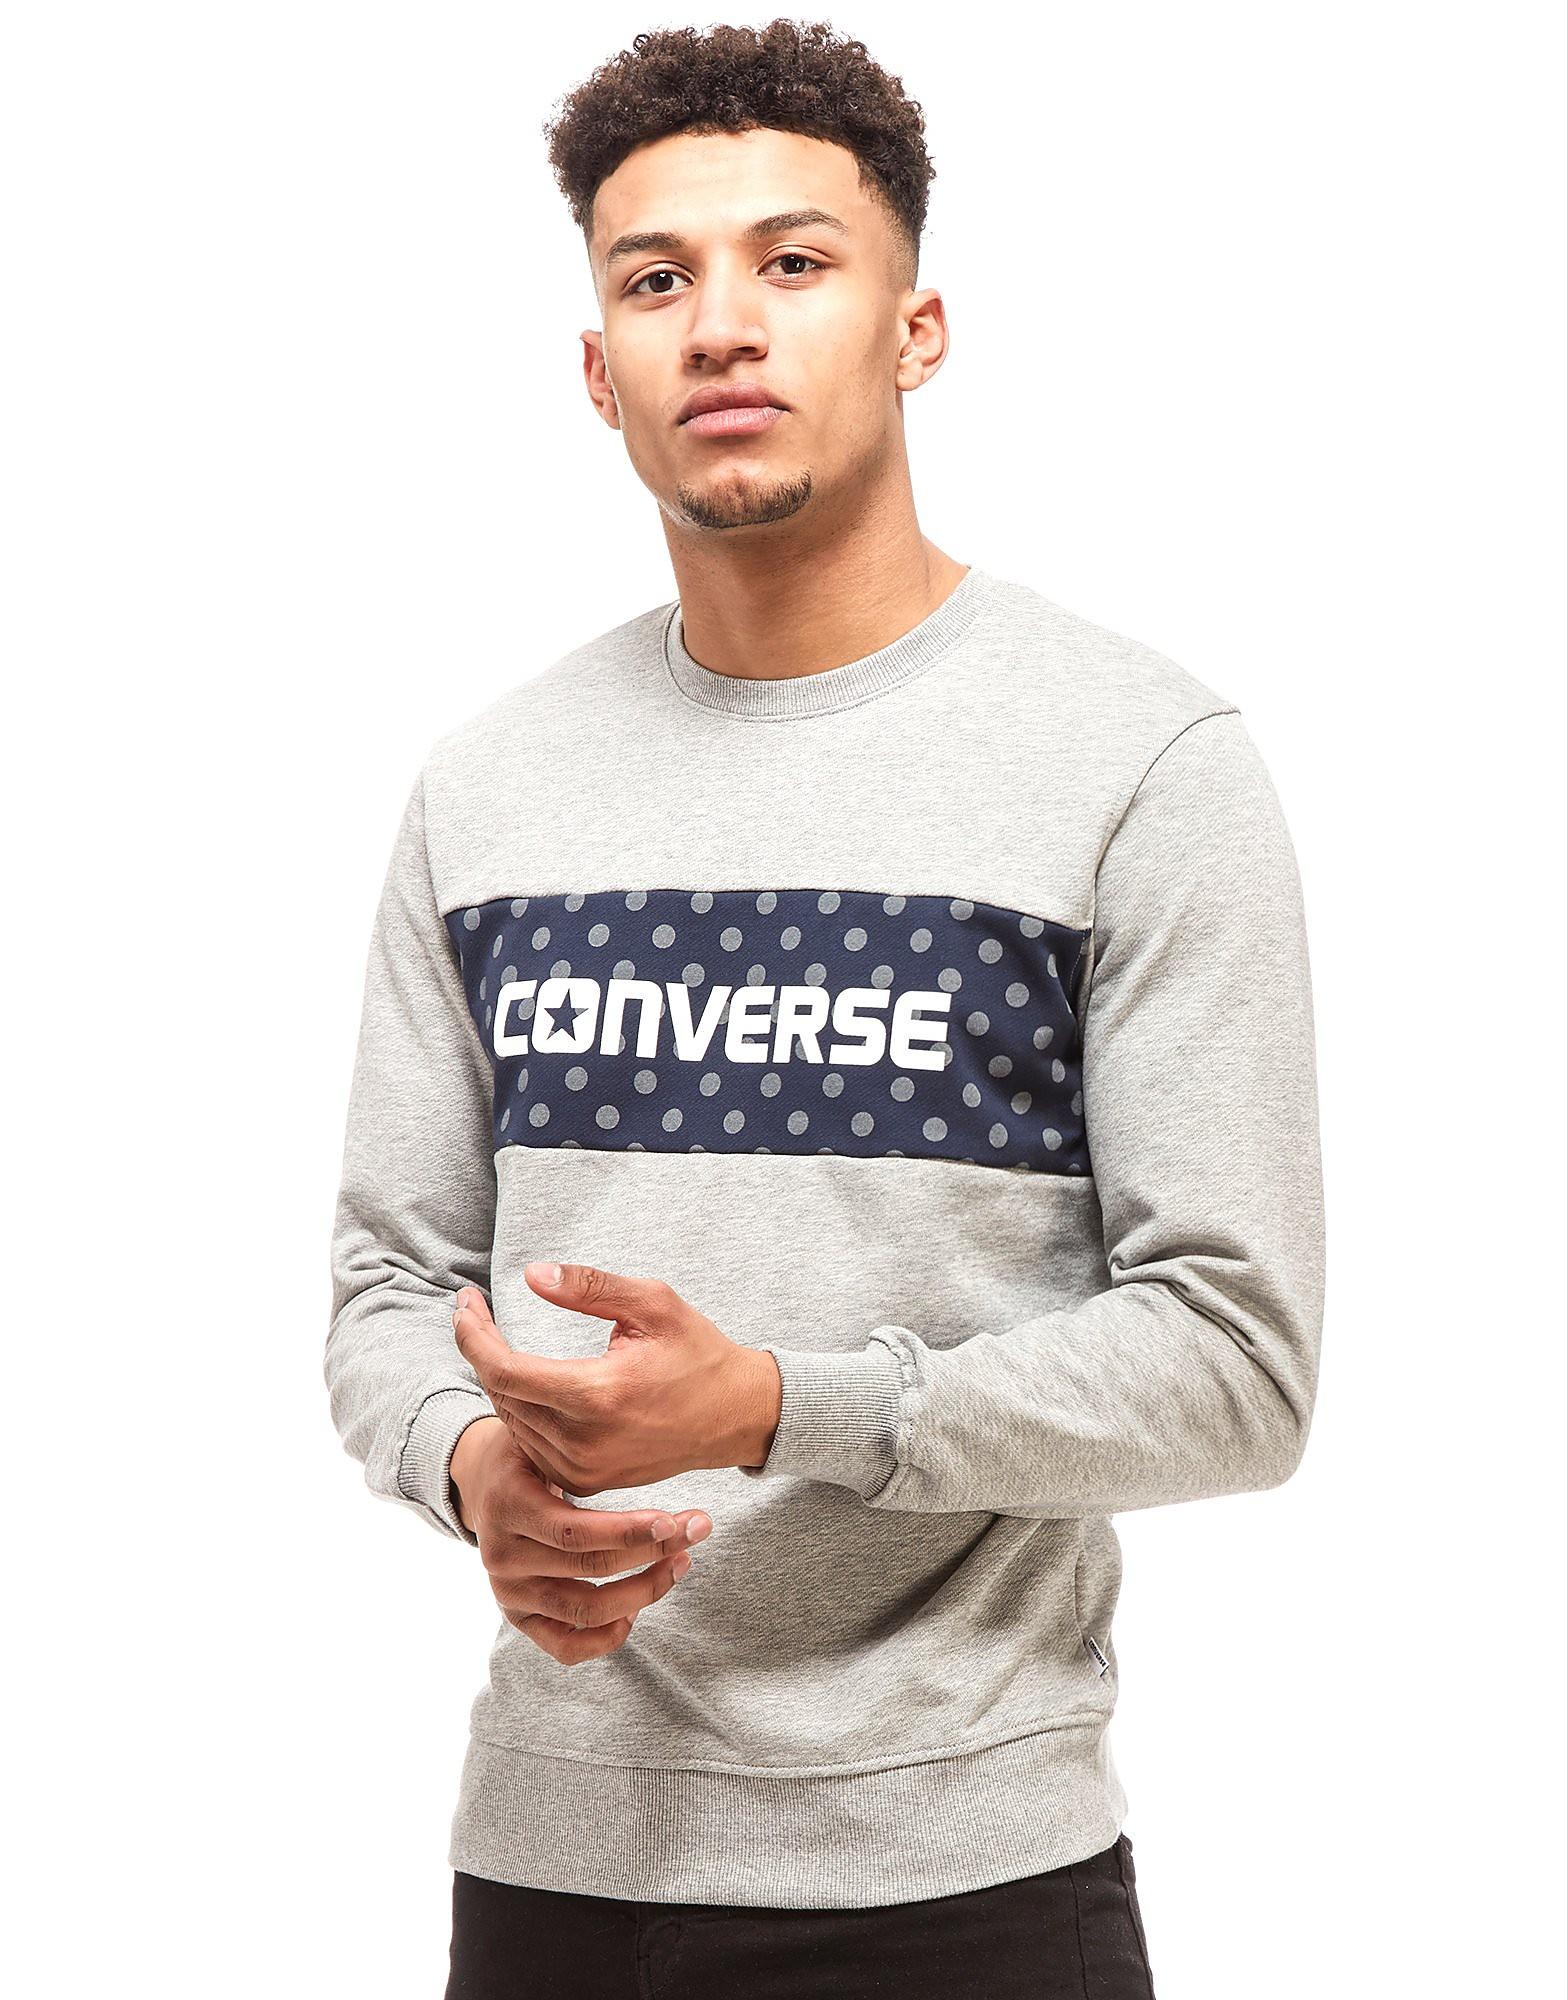 Converse Micro Dot Sweatshirt